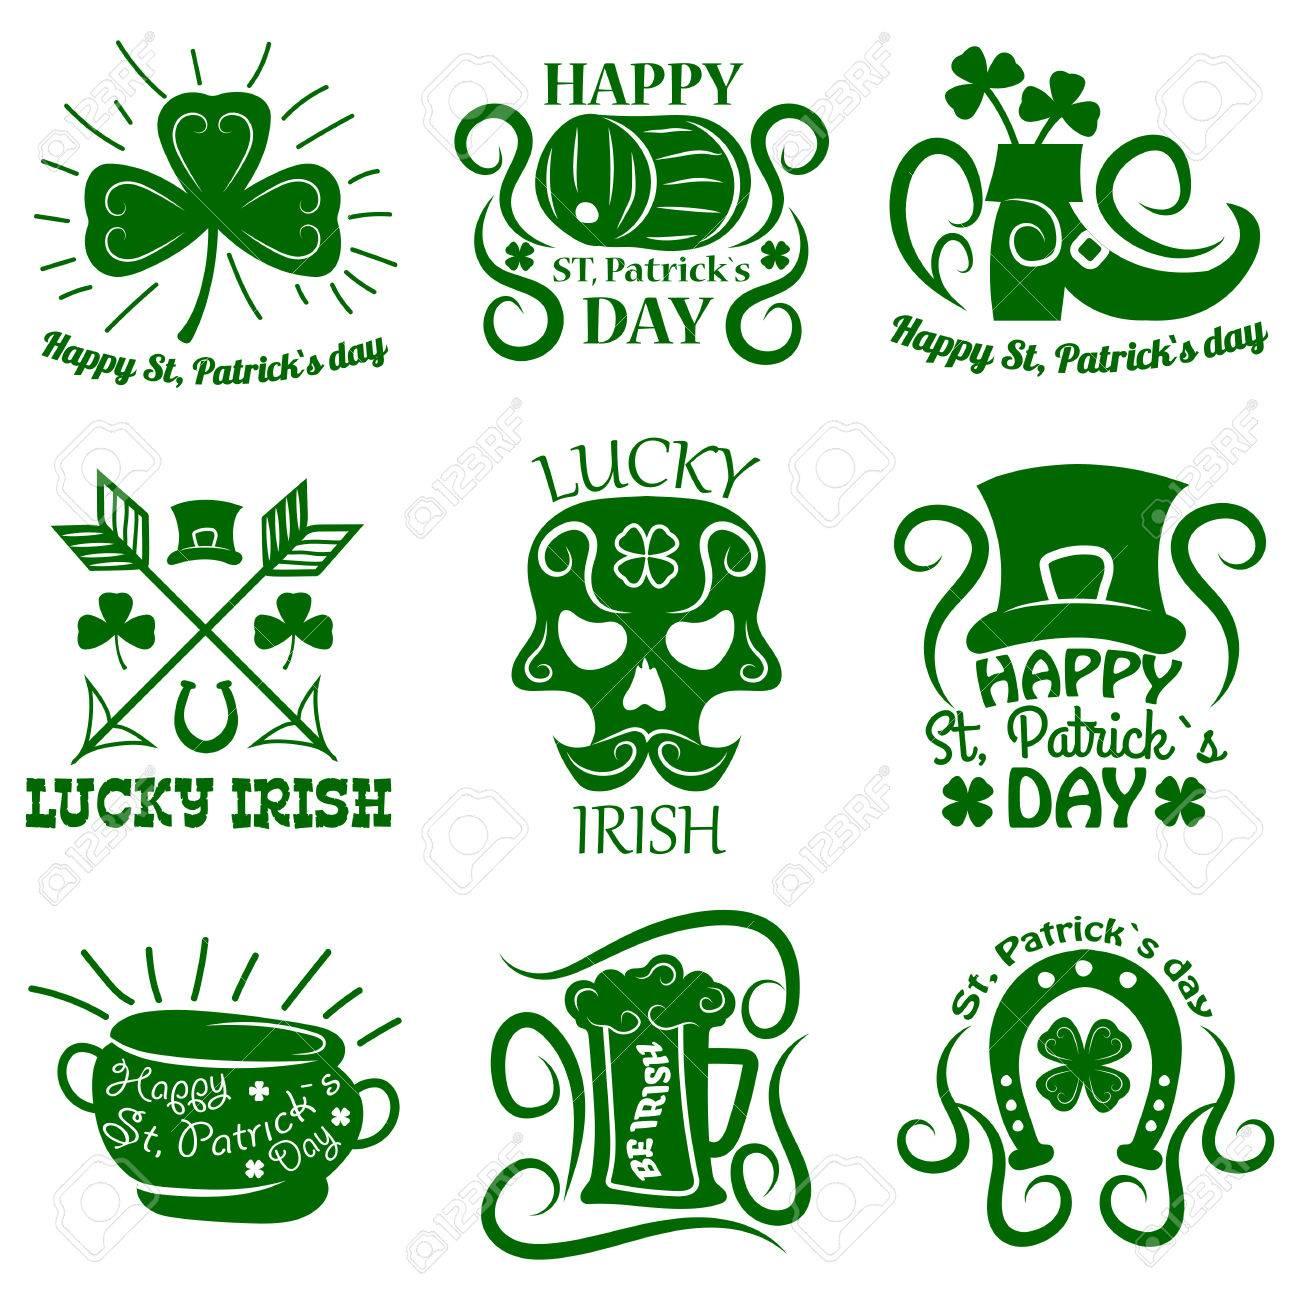 Saint patrick logos set of clover leaf and leprechaun symbols saint patrick logos set of clover leaf and leprechaun symbols stock vector 72312428 biocorpaavc